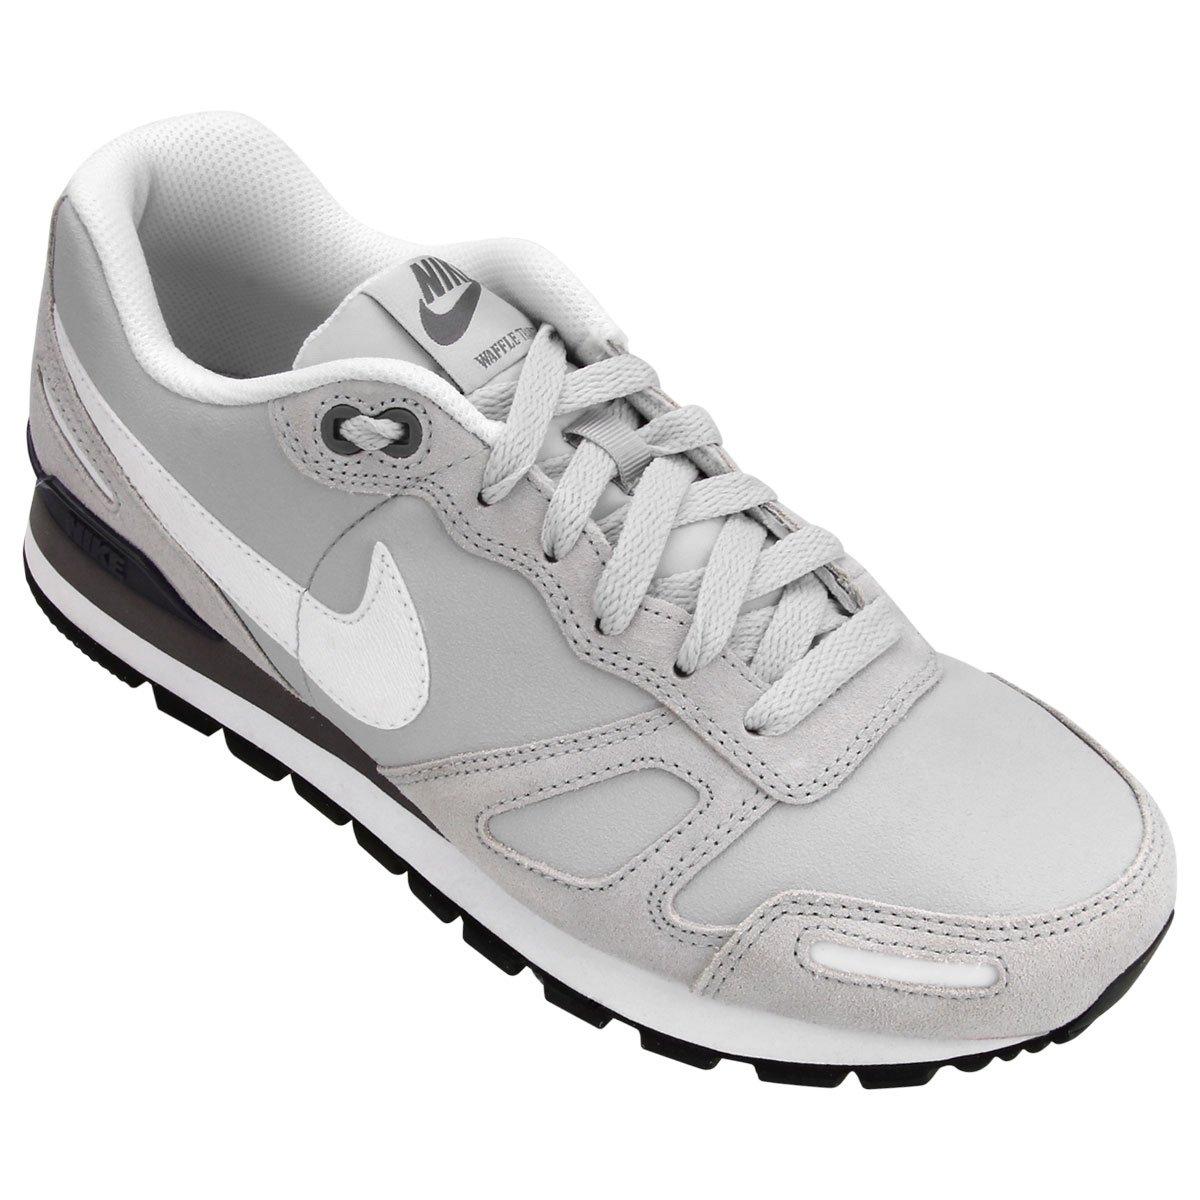 1e7271afe Tênis Nike Air Waffle Trainer Leather - Compre Agora